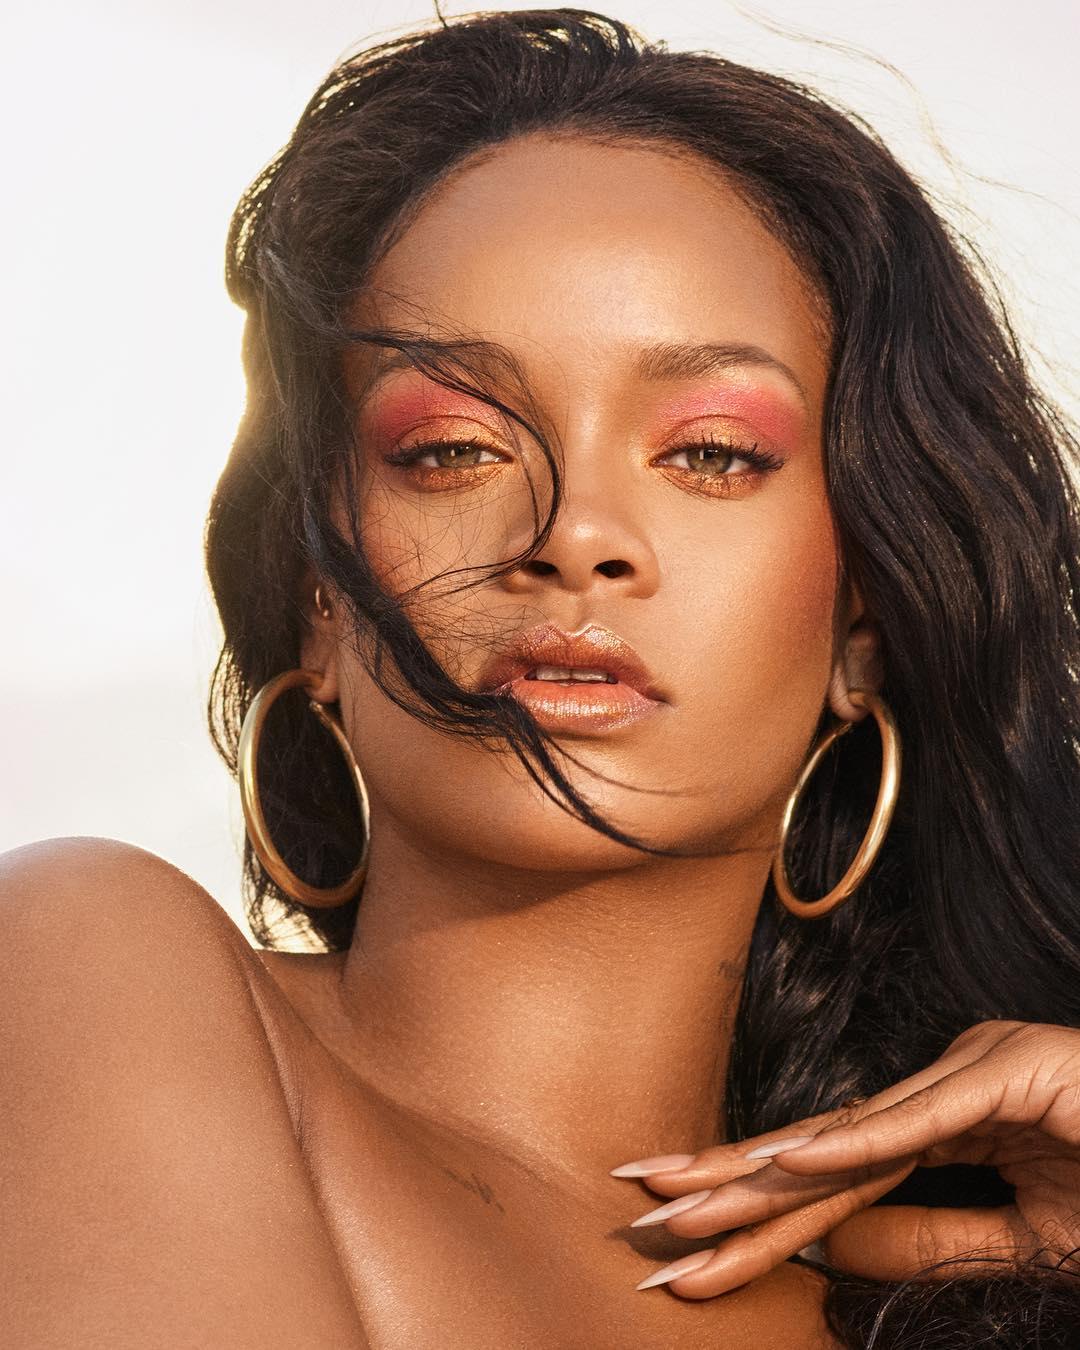 Brincos para praia Rihanna